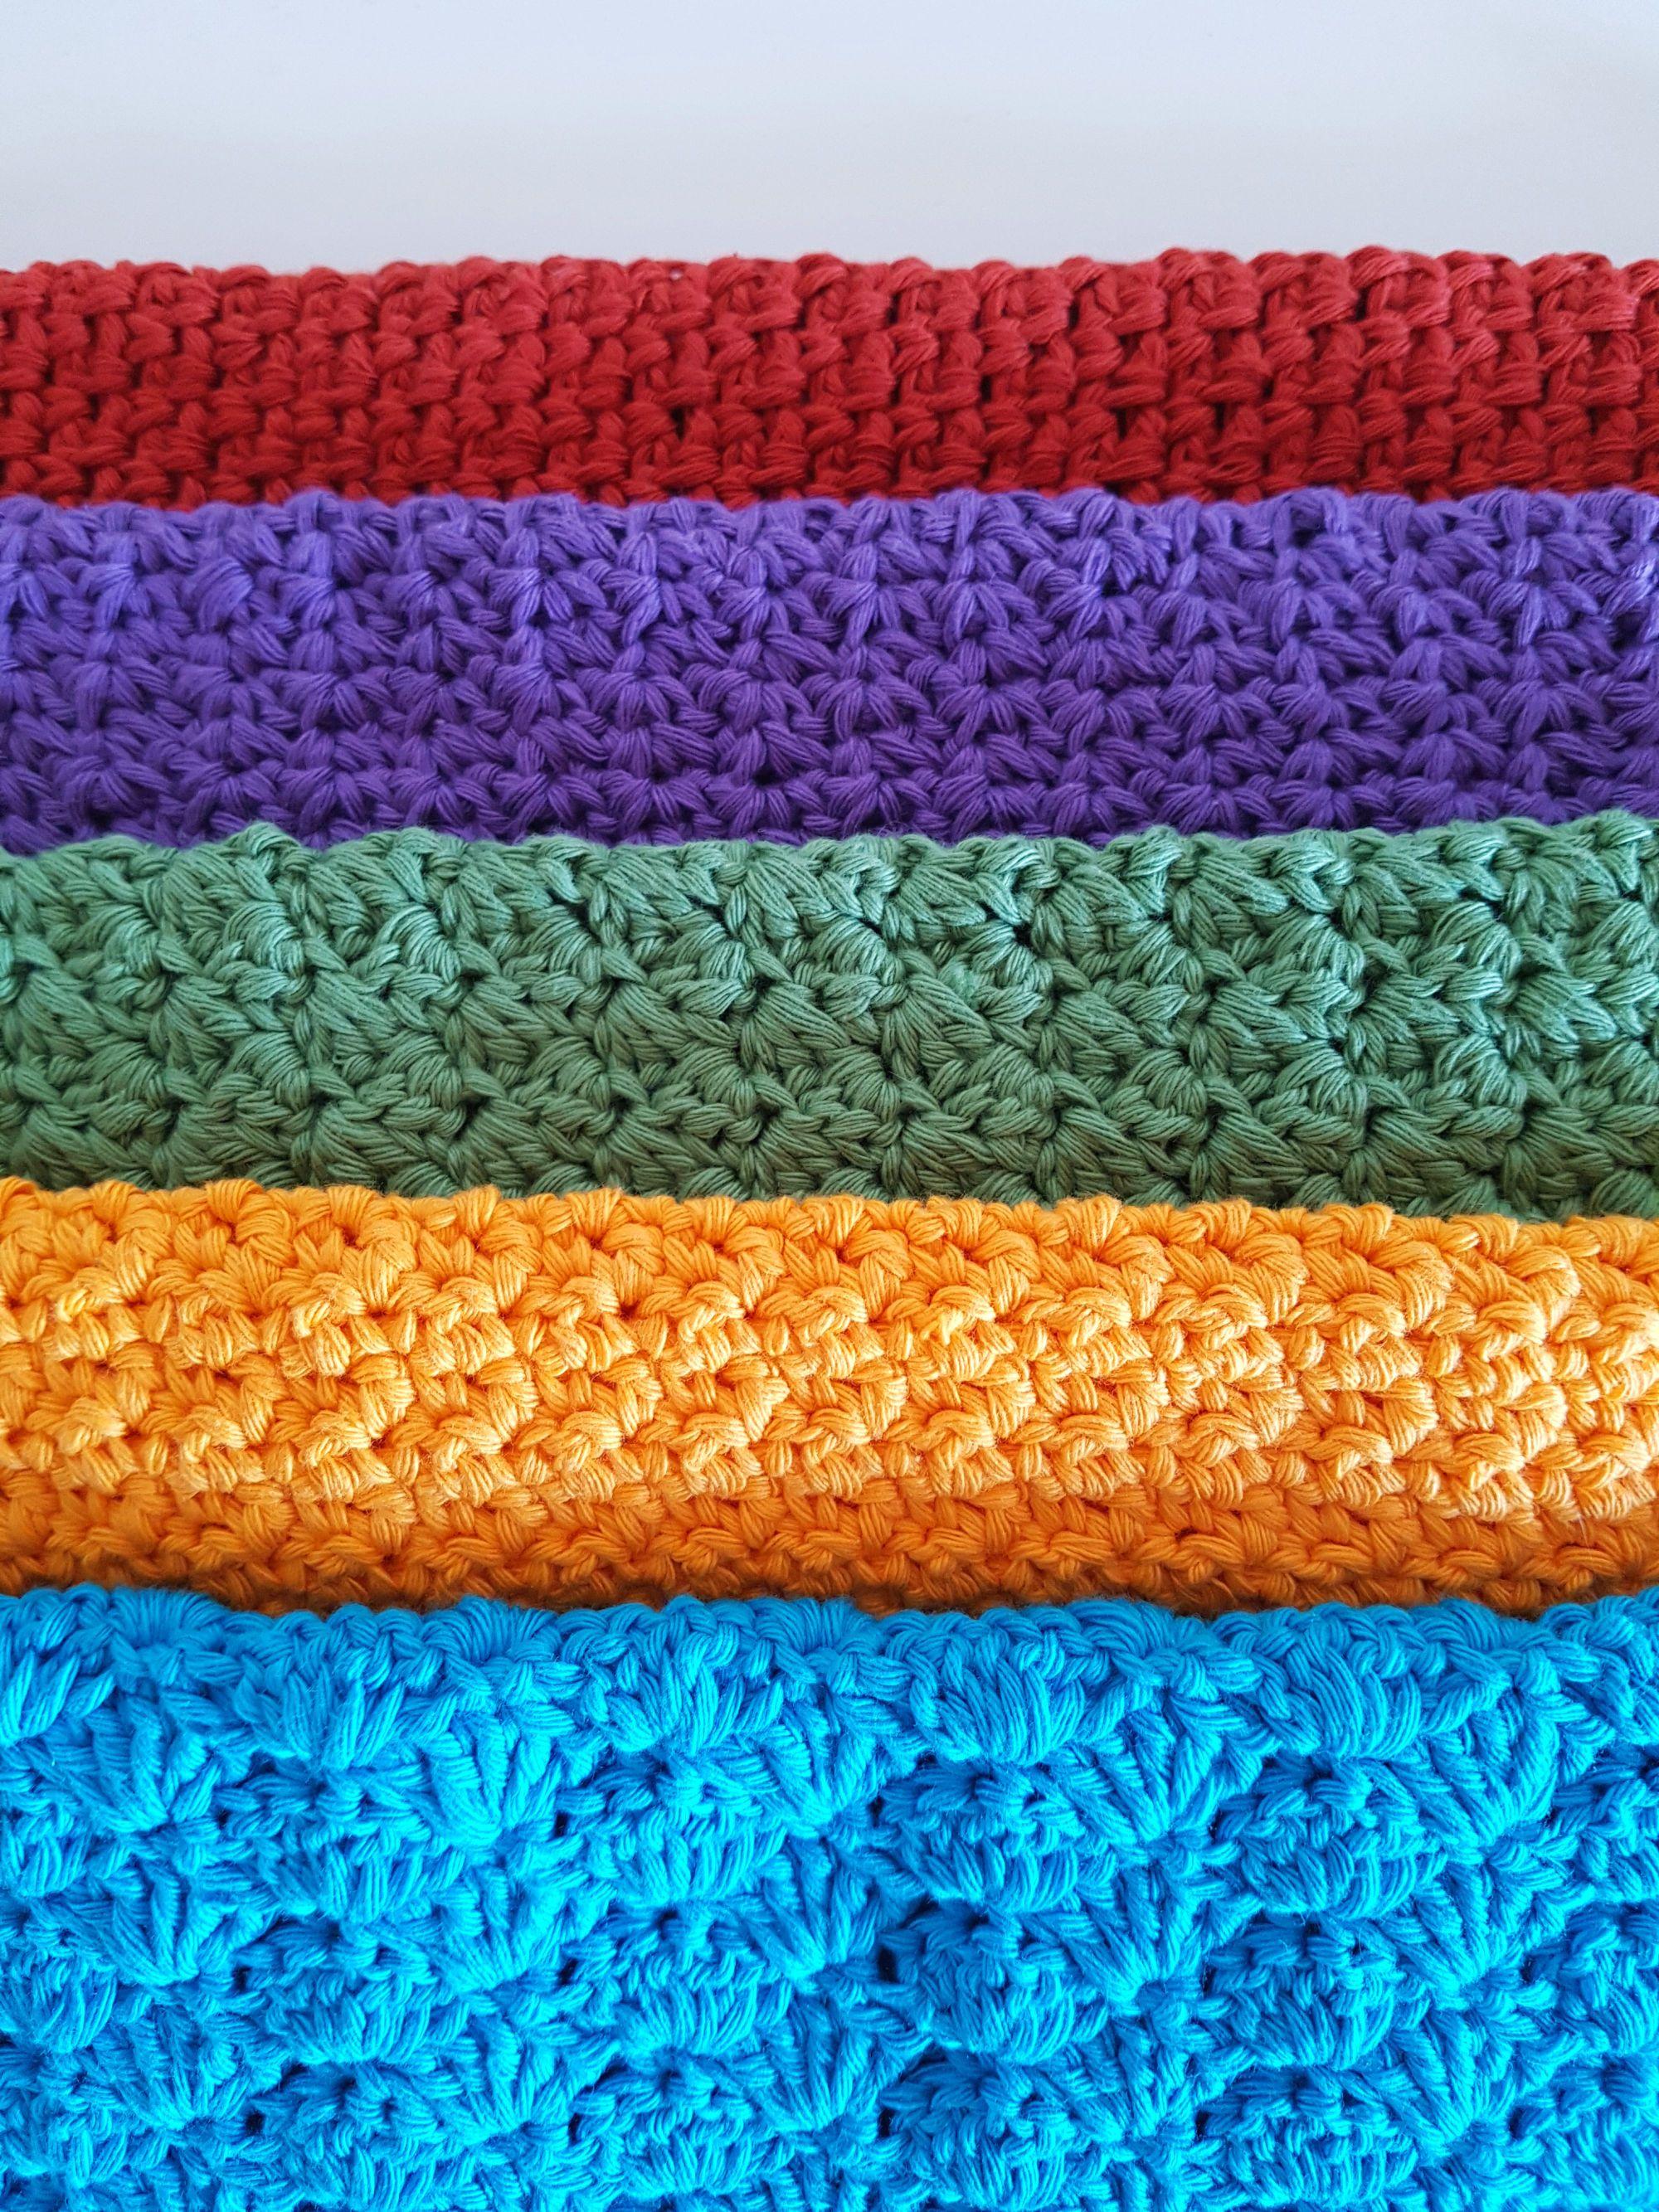 Quillies | Knitted washcloth patterns, Washcloth pattern ...